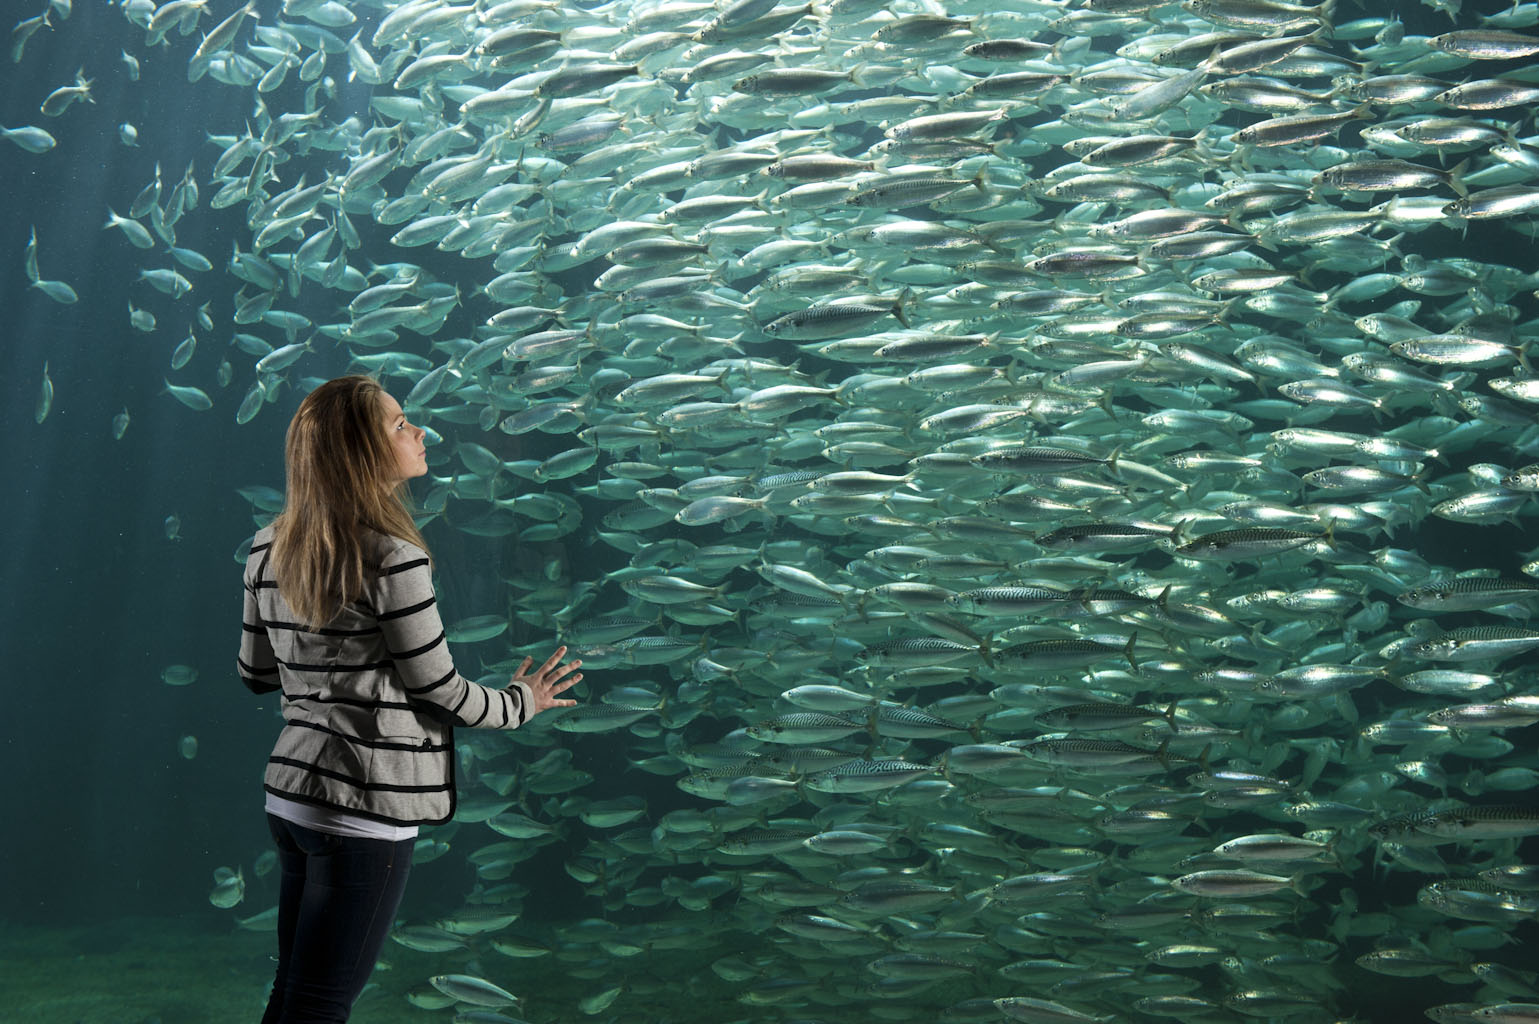 Hering - das Silber des Meeres